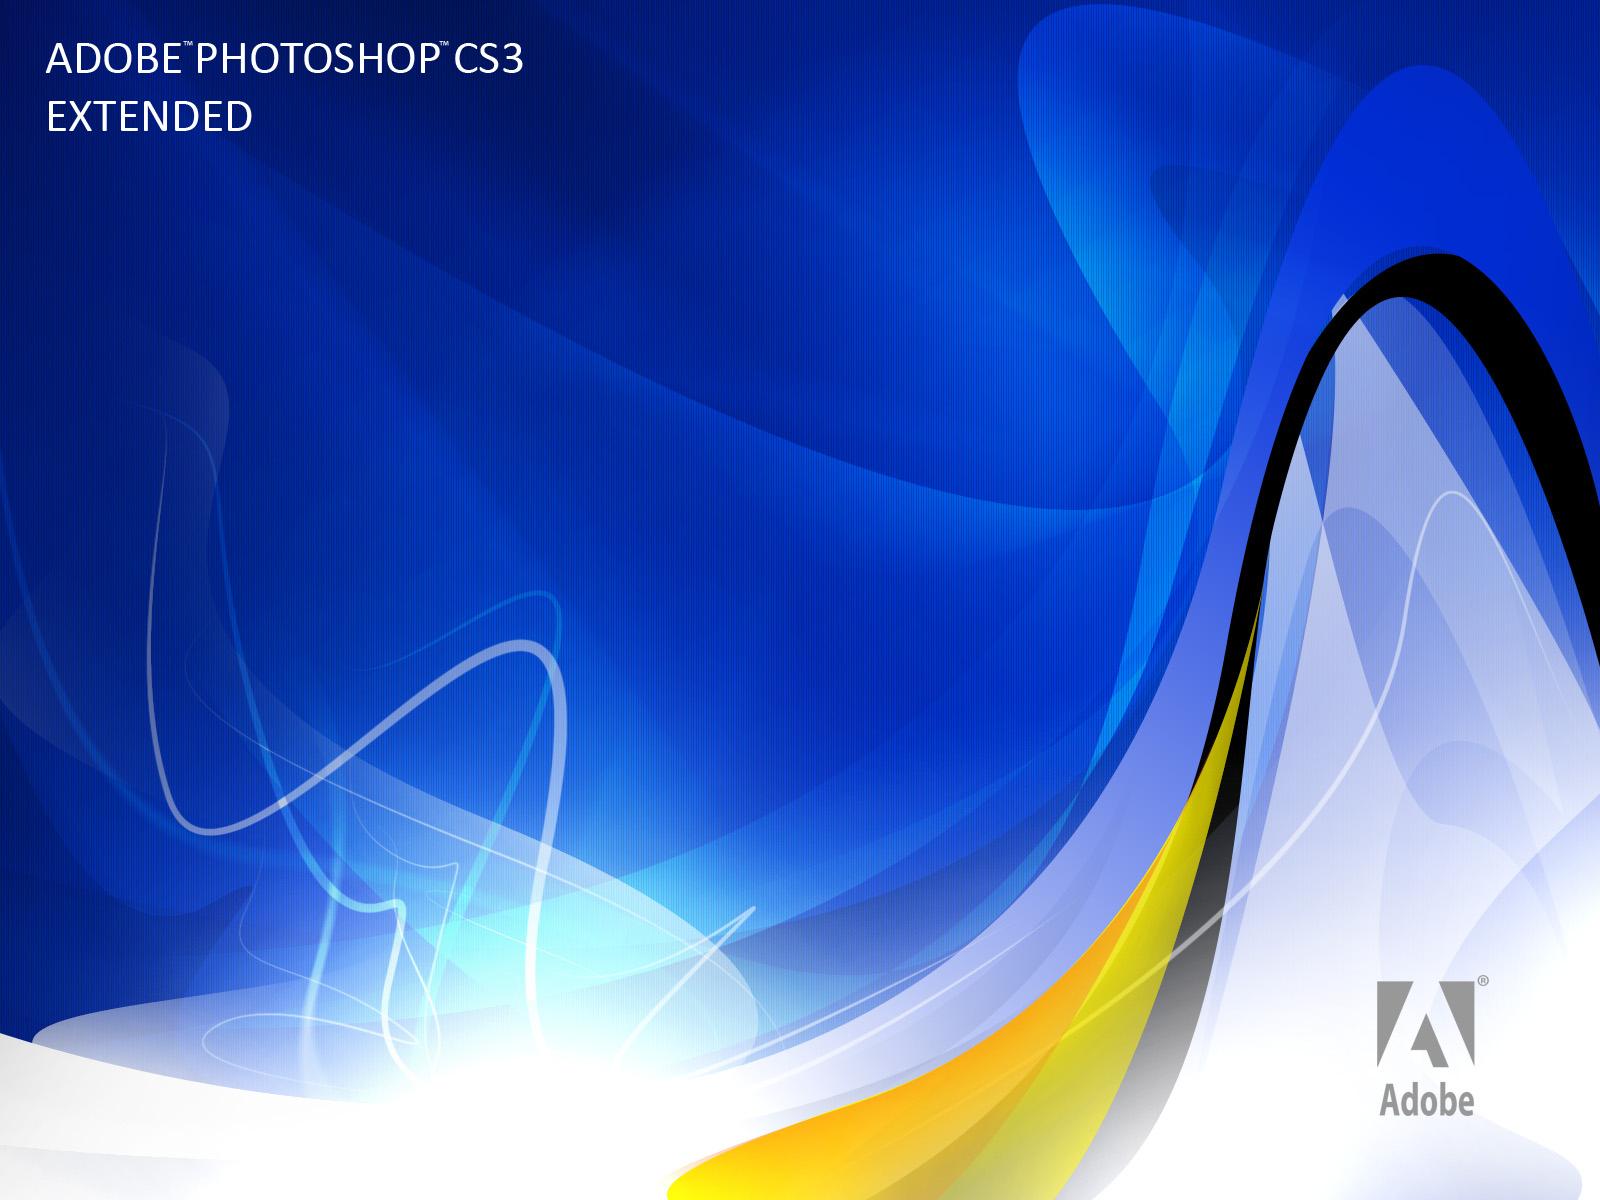 cs3 download kostenlos deutsch